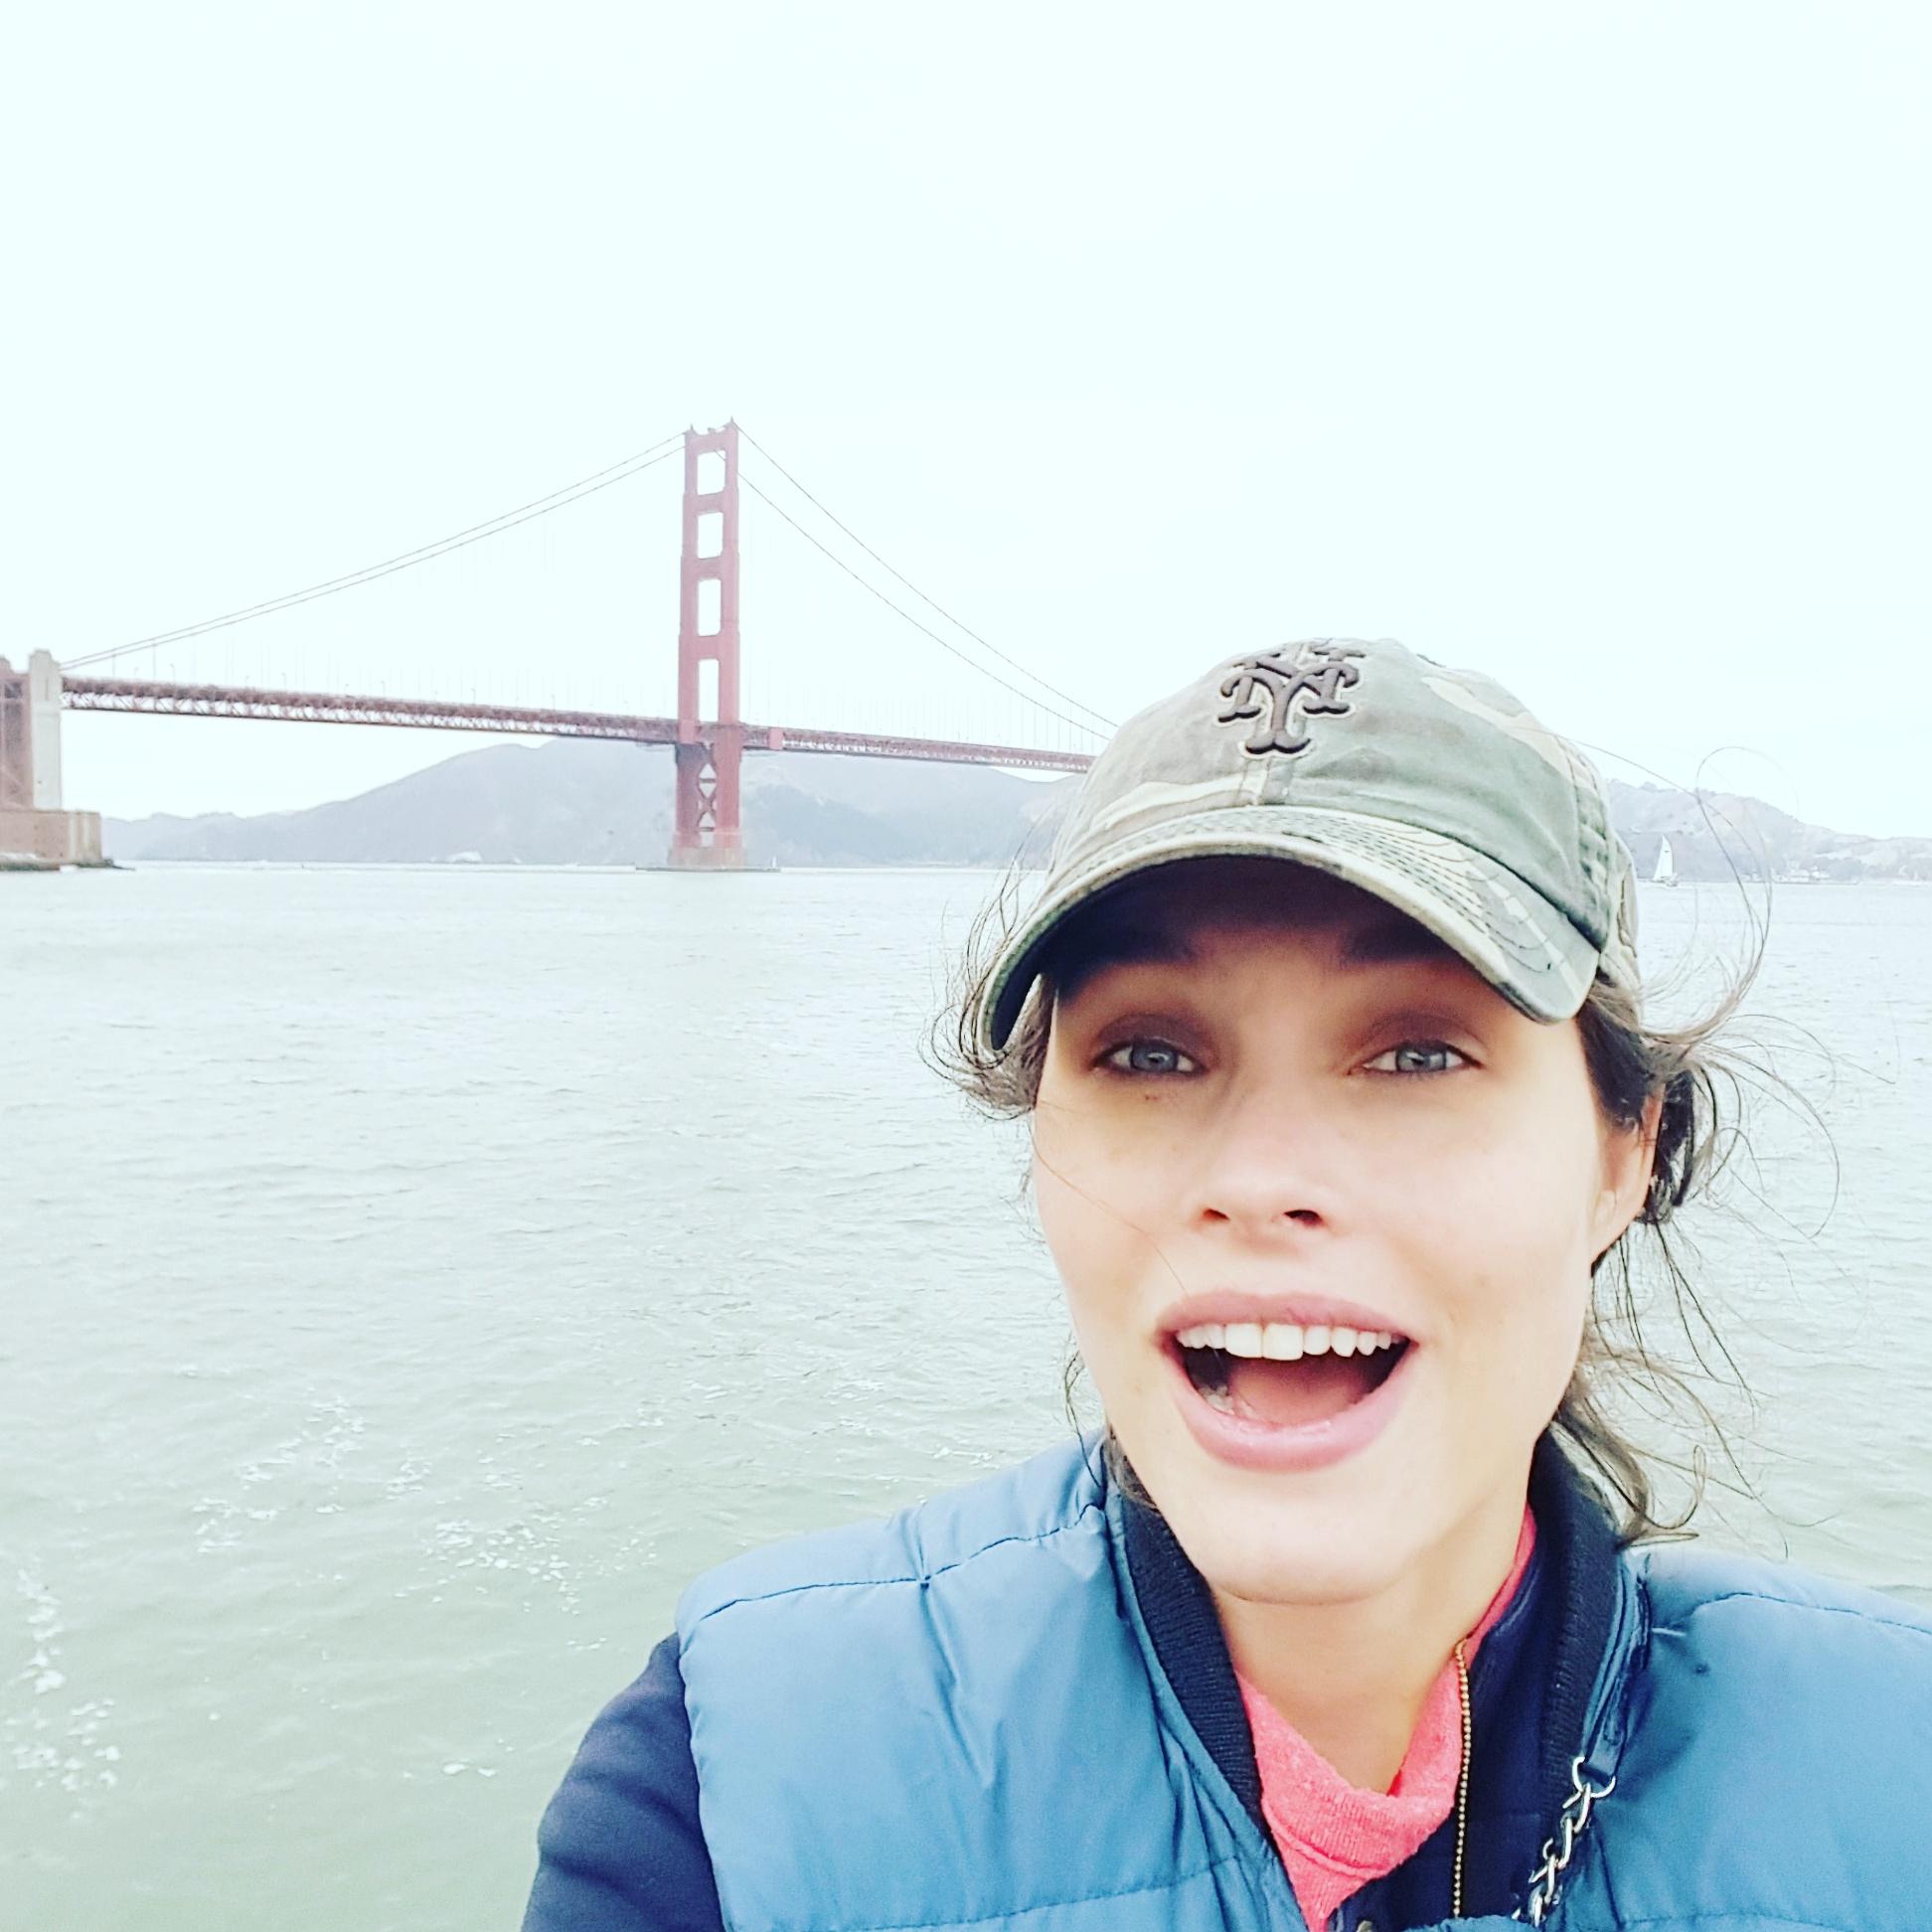 2016-08 San Francisco Golden Gate Bridge Lonneke Engel 2